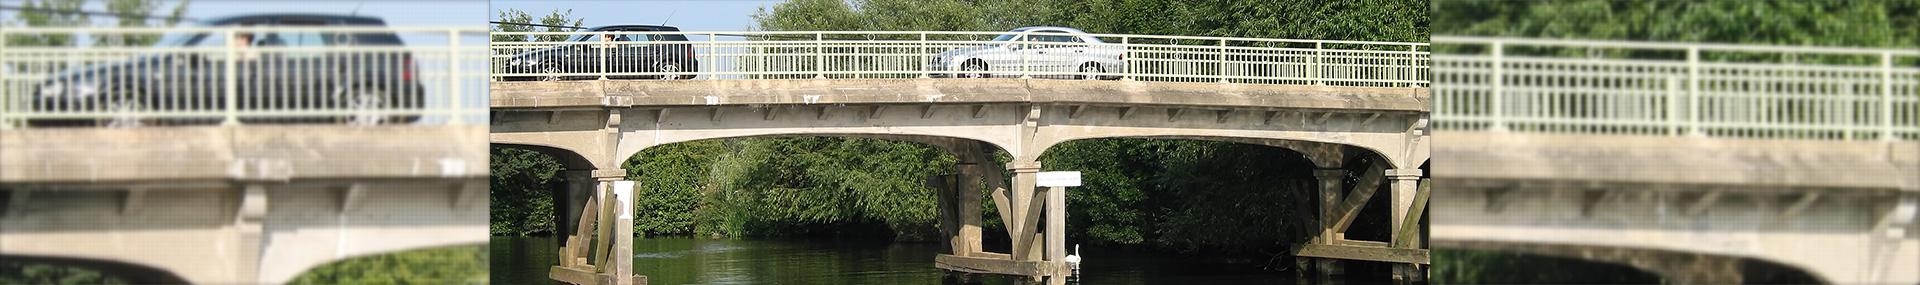 Bow_Bridge_Banner